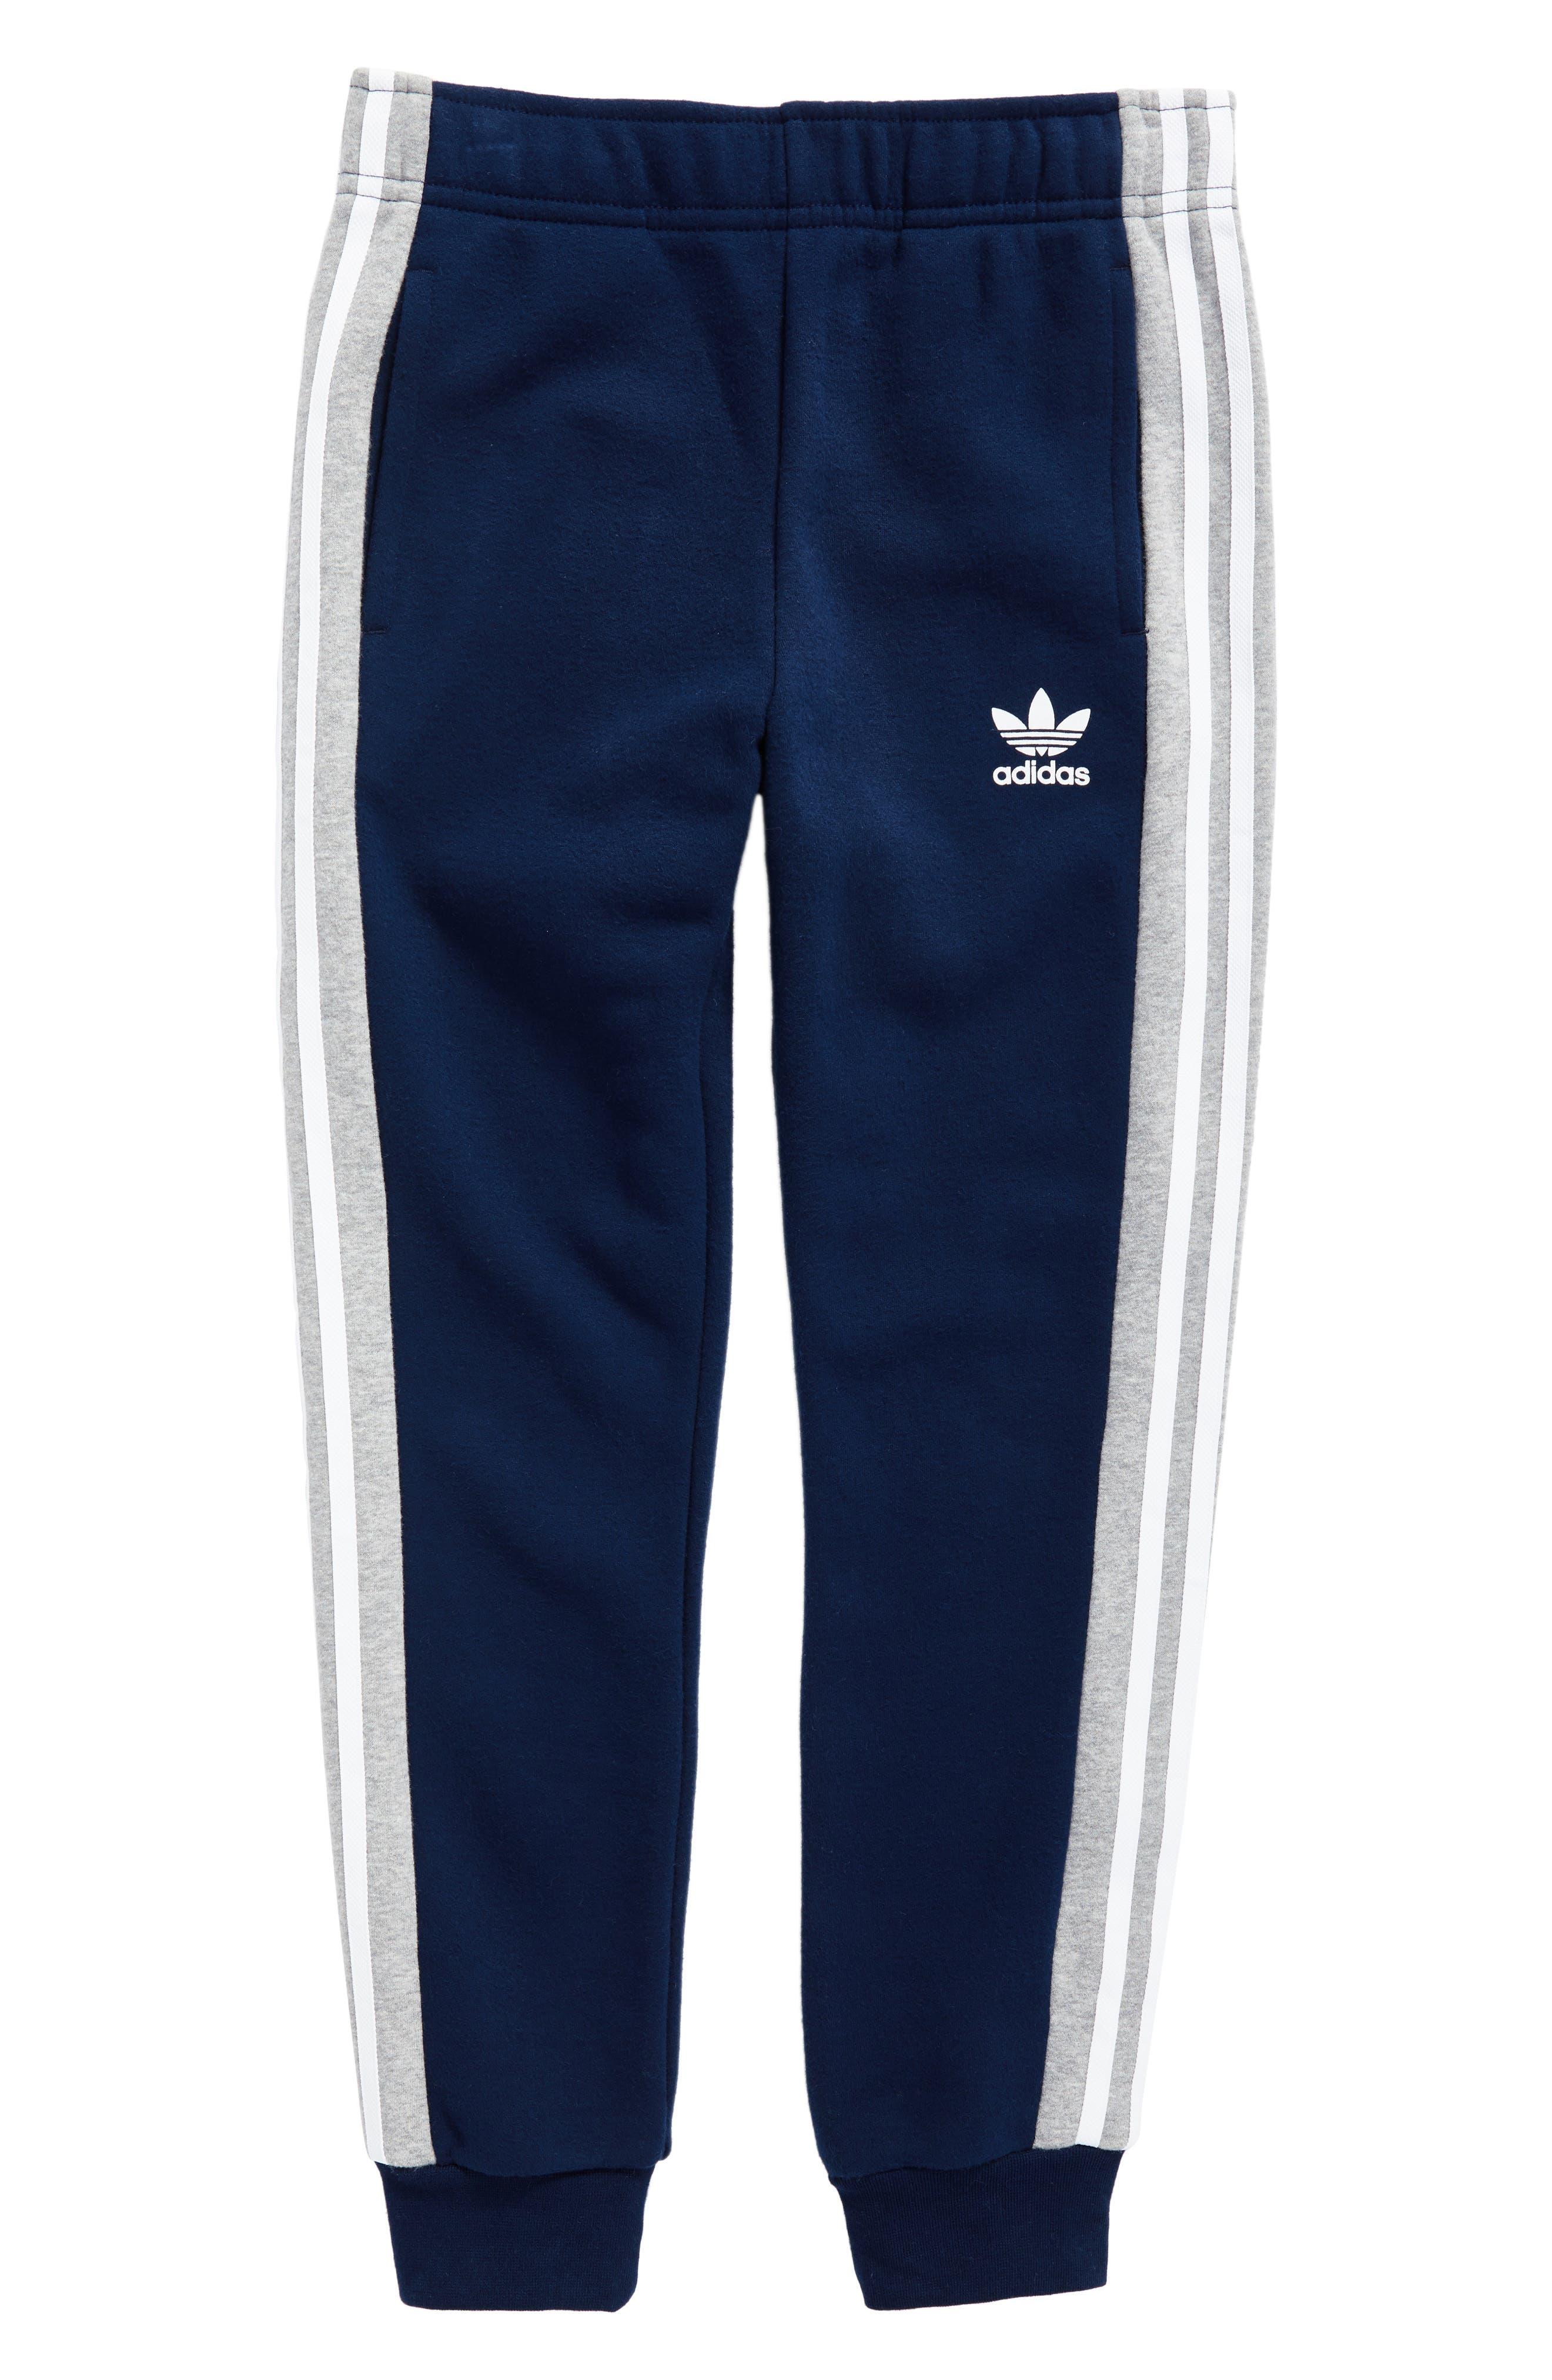 adidas FL Jogger Pants,                         Main,                         color, 415